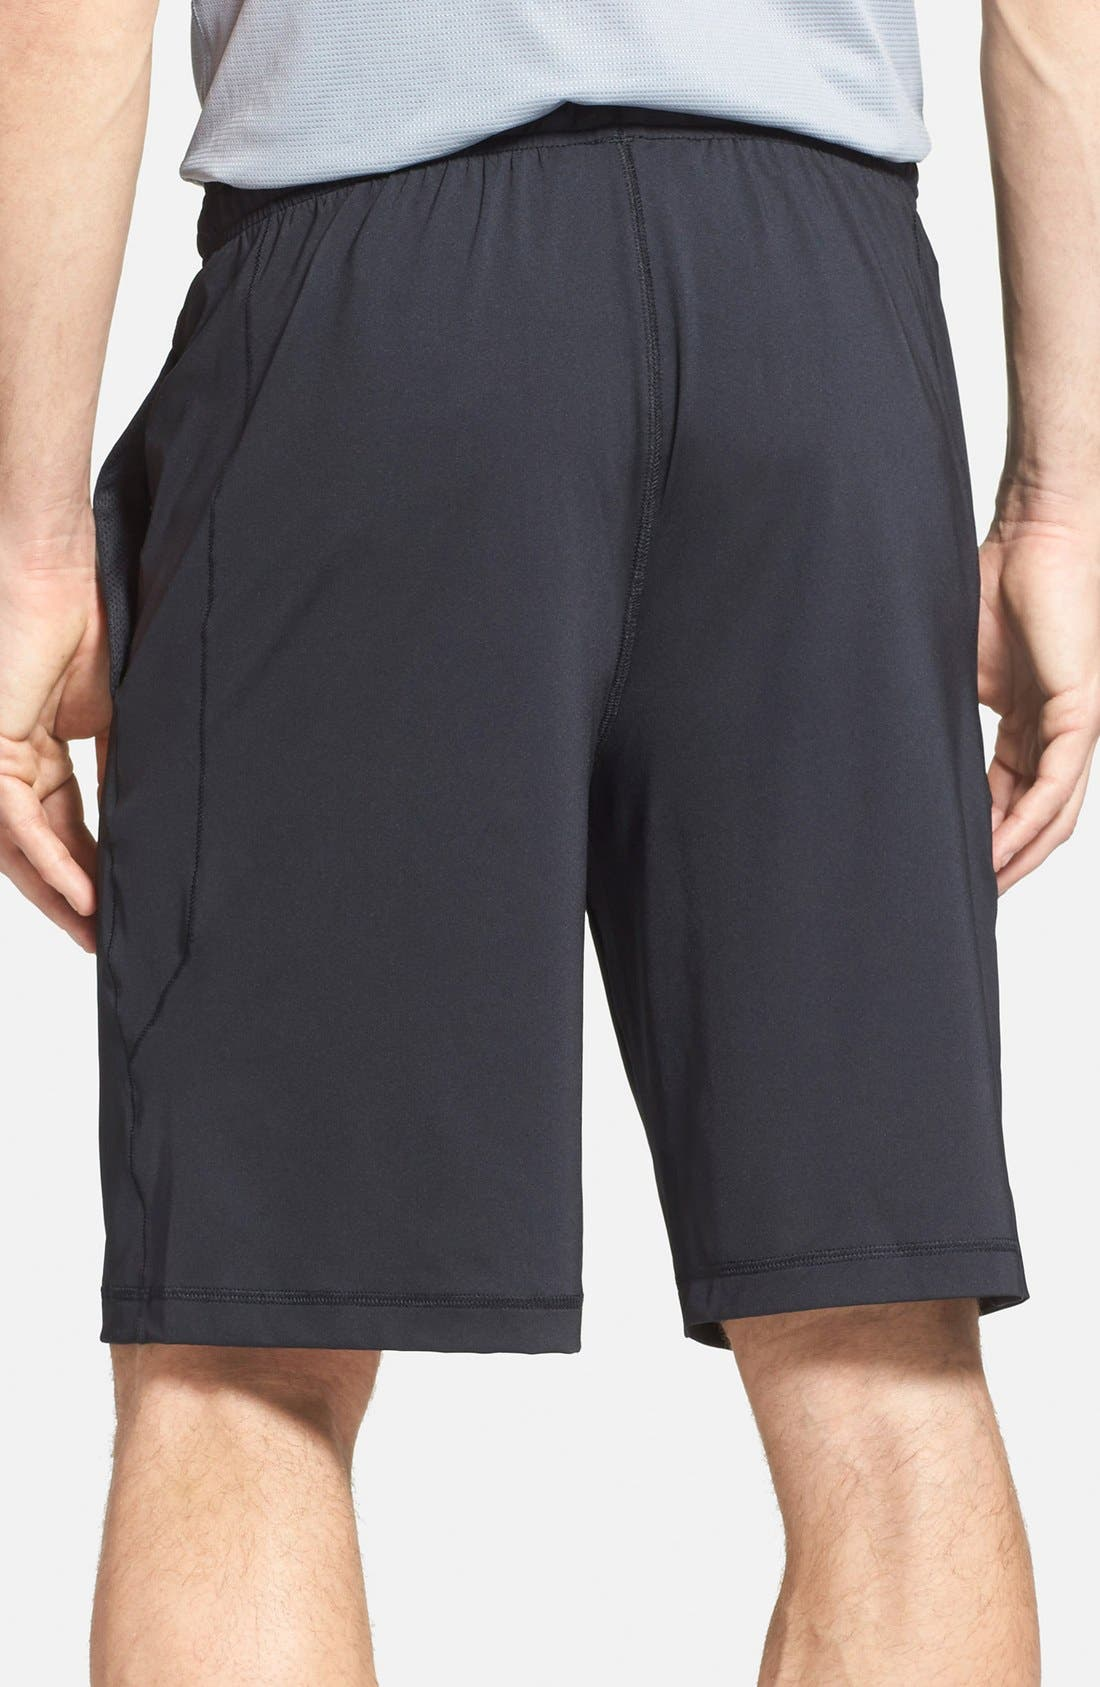 'Raid' HeatGear<sup>®</sup> Loose-Fit Athletic Shorts,                             Alternate thumbnail 4, color,                             001